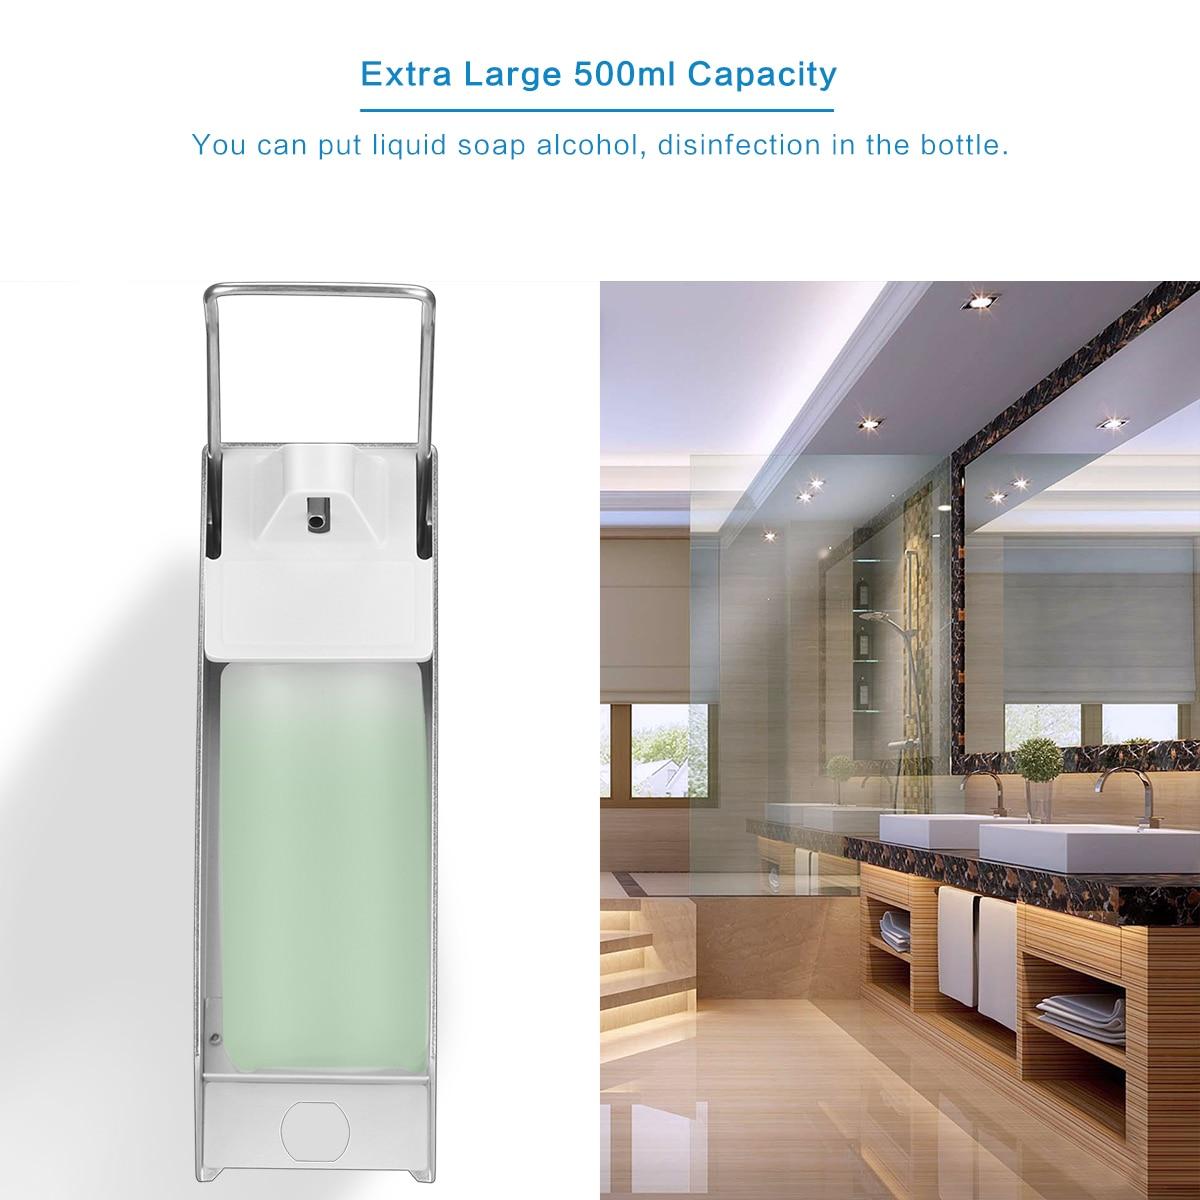 H9f04acd188034f38ba44780c826d53ebw Wall-Mount Liquid Soap Dispenser Pump Hospital Elbow Press Hand Sanitizer Soap Dispenser Bottle For Kitchen Hotel Bathroom